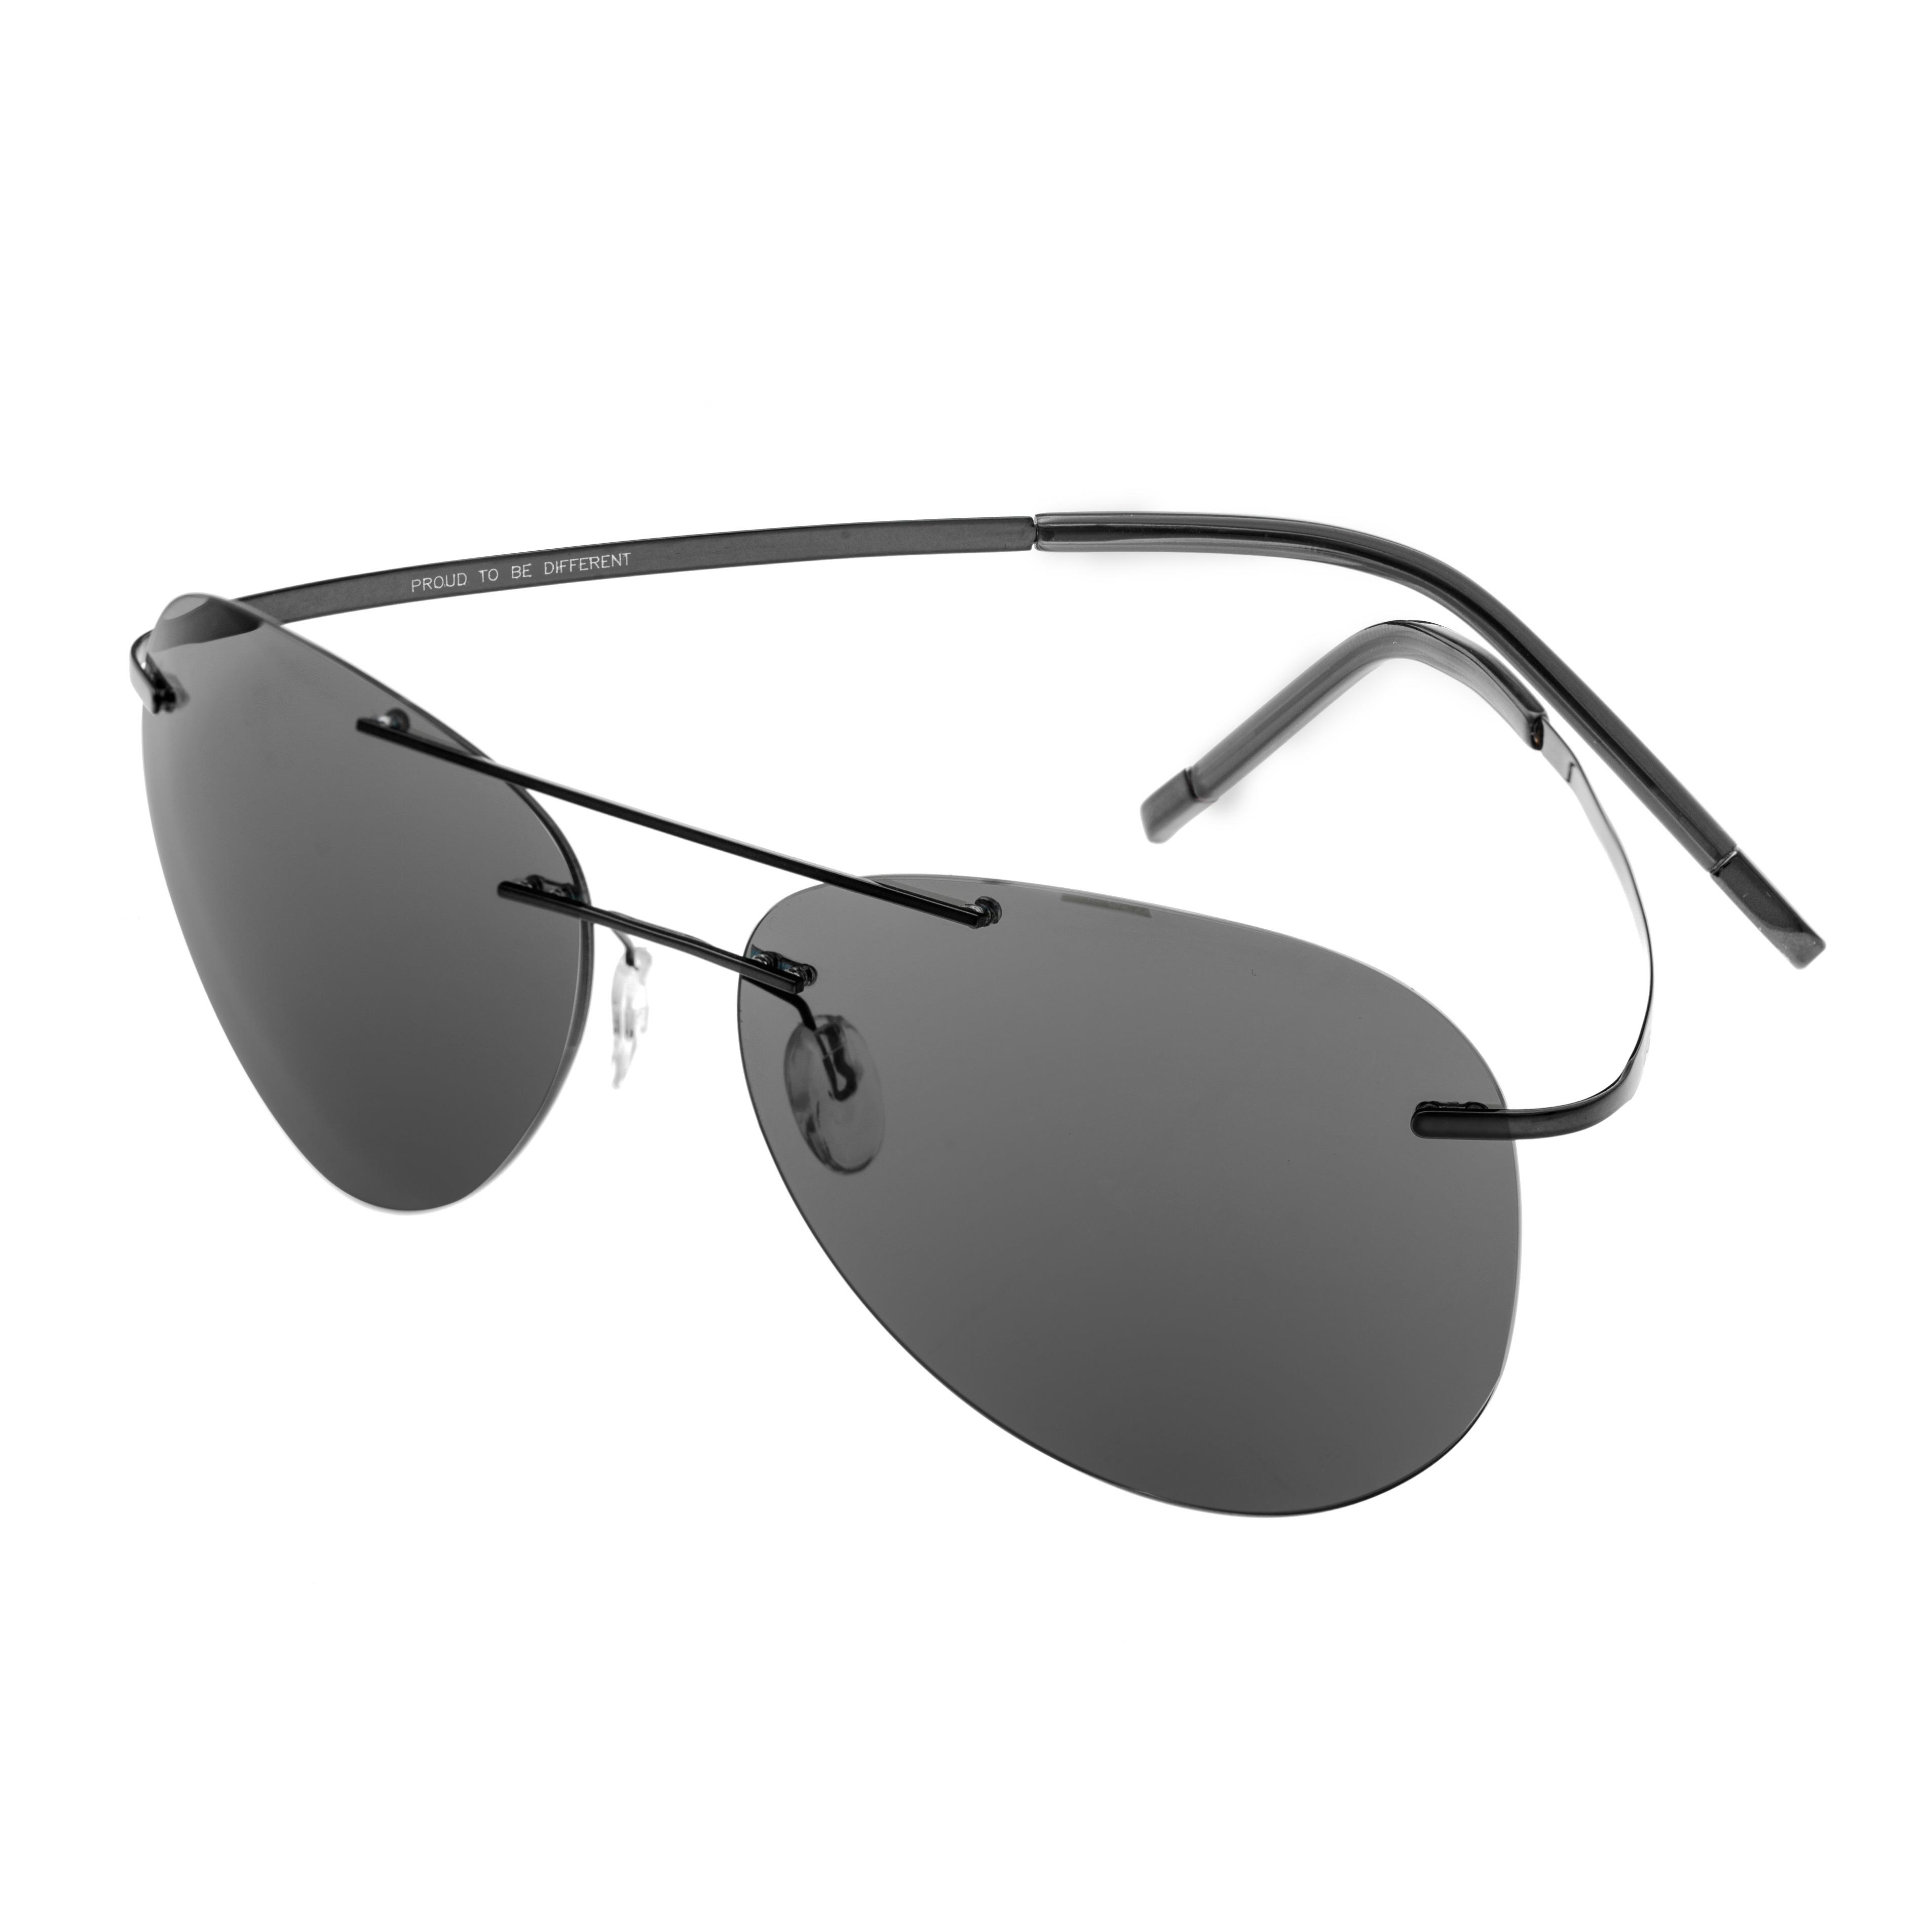 d1d53cbc17 Breed Sunglasses Luna Sunglasses